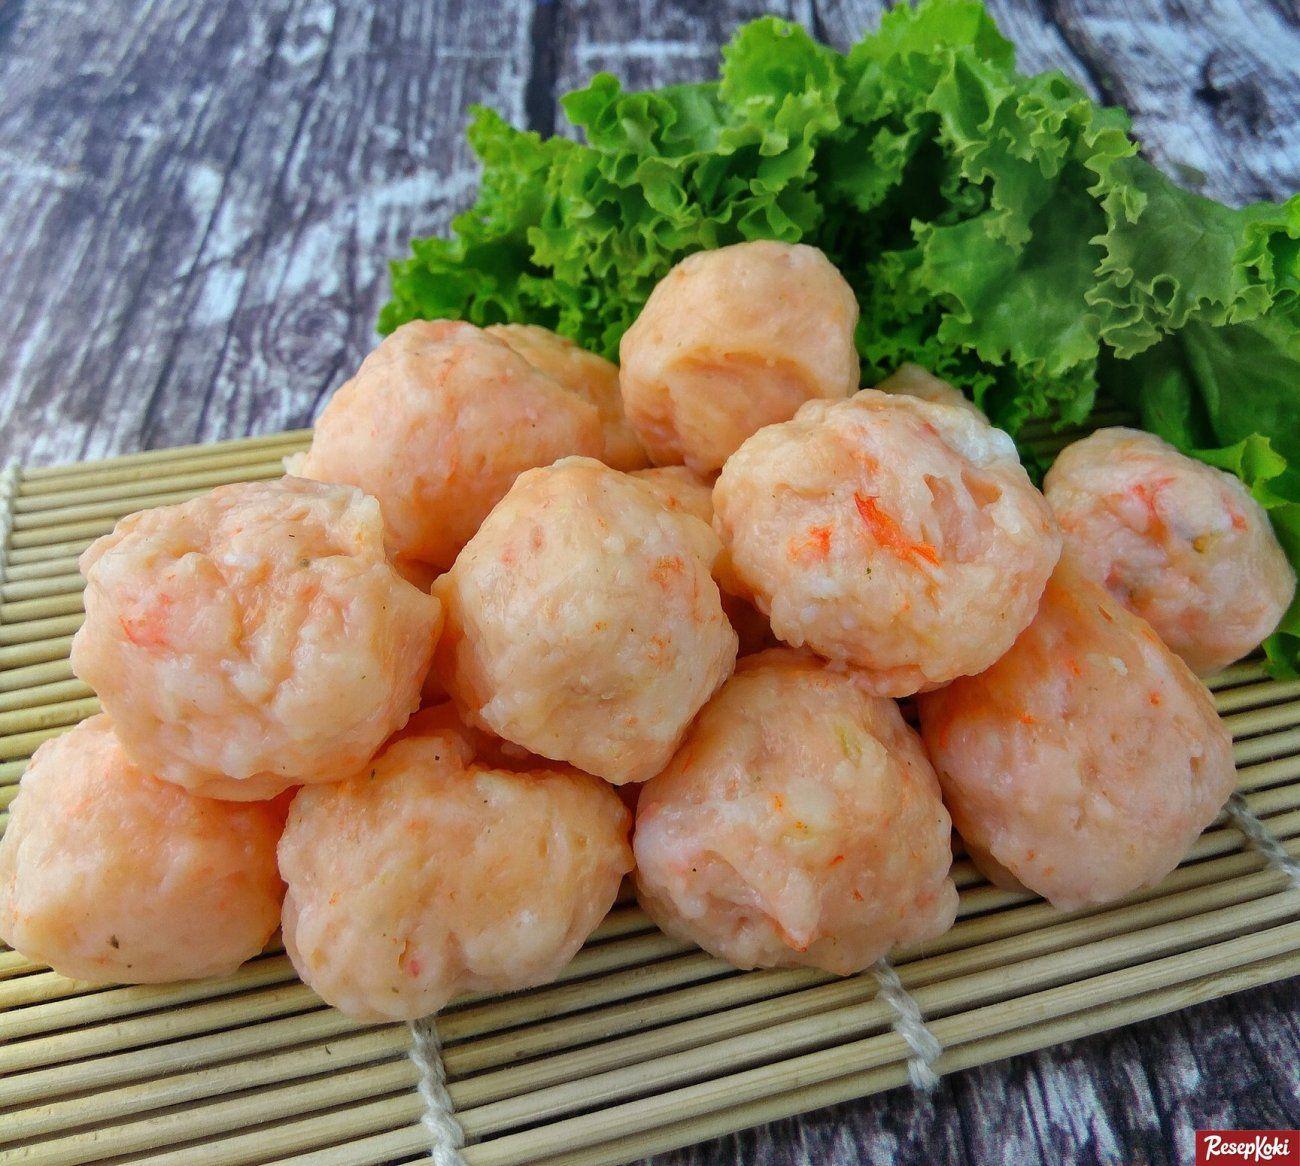 Bakso Udang Rebus Kenyal Istimewa Resep Resepkoki Resep Resep Udang Resep Resep Masakan Indonesia